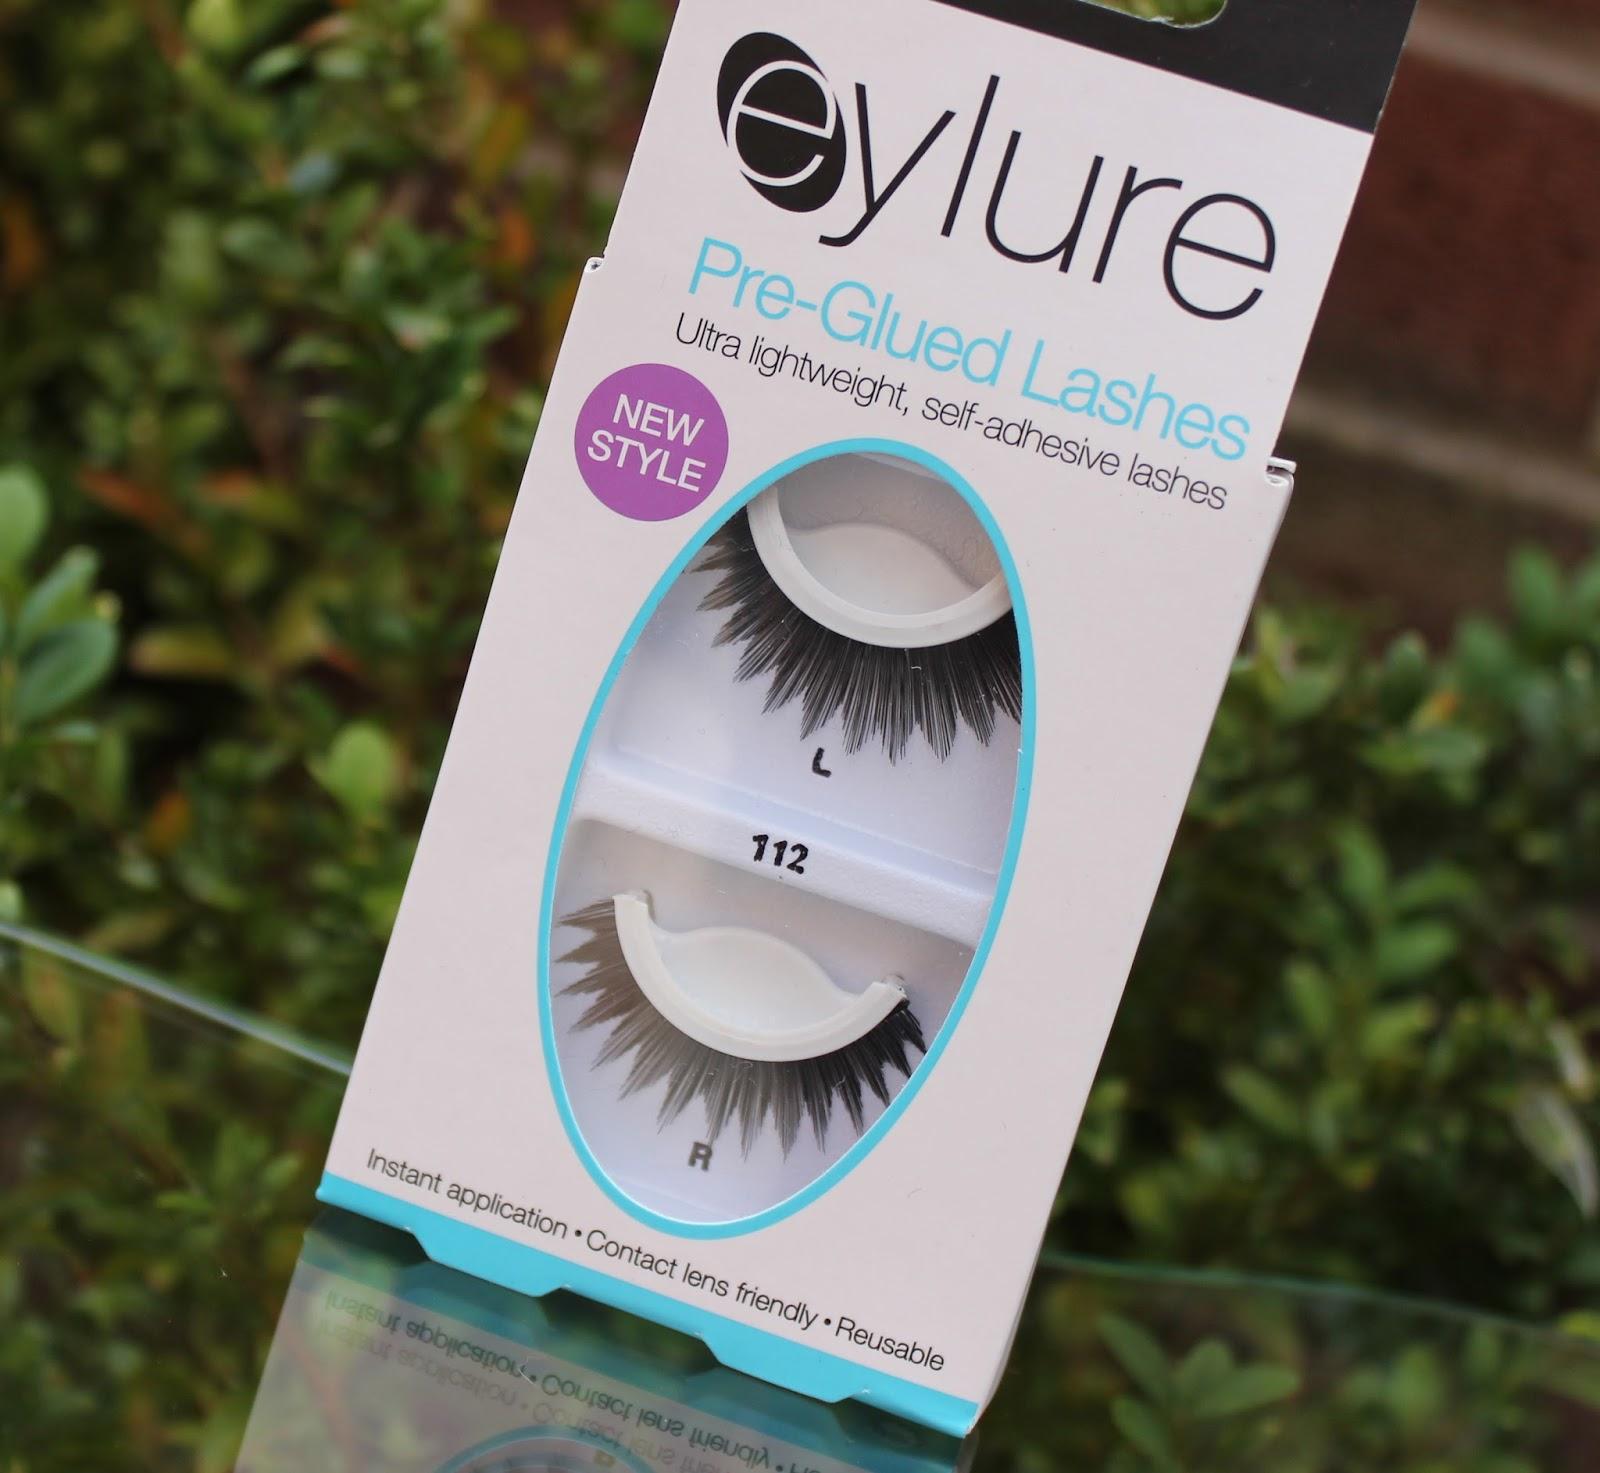 Review Eylure Pre Glued Lashes 112 Through Chelseas Eyes